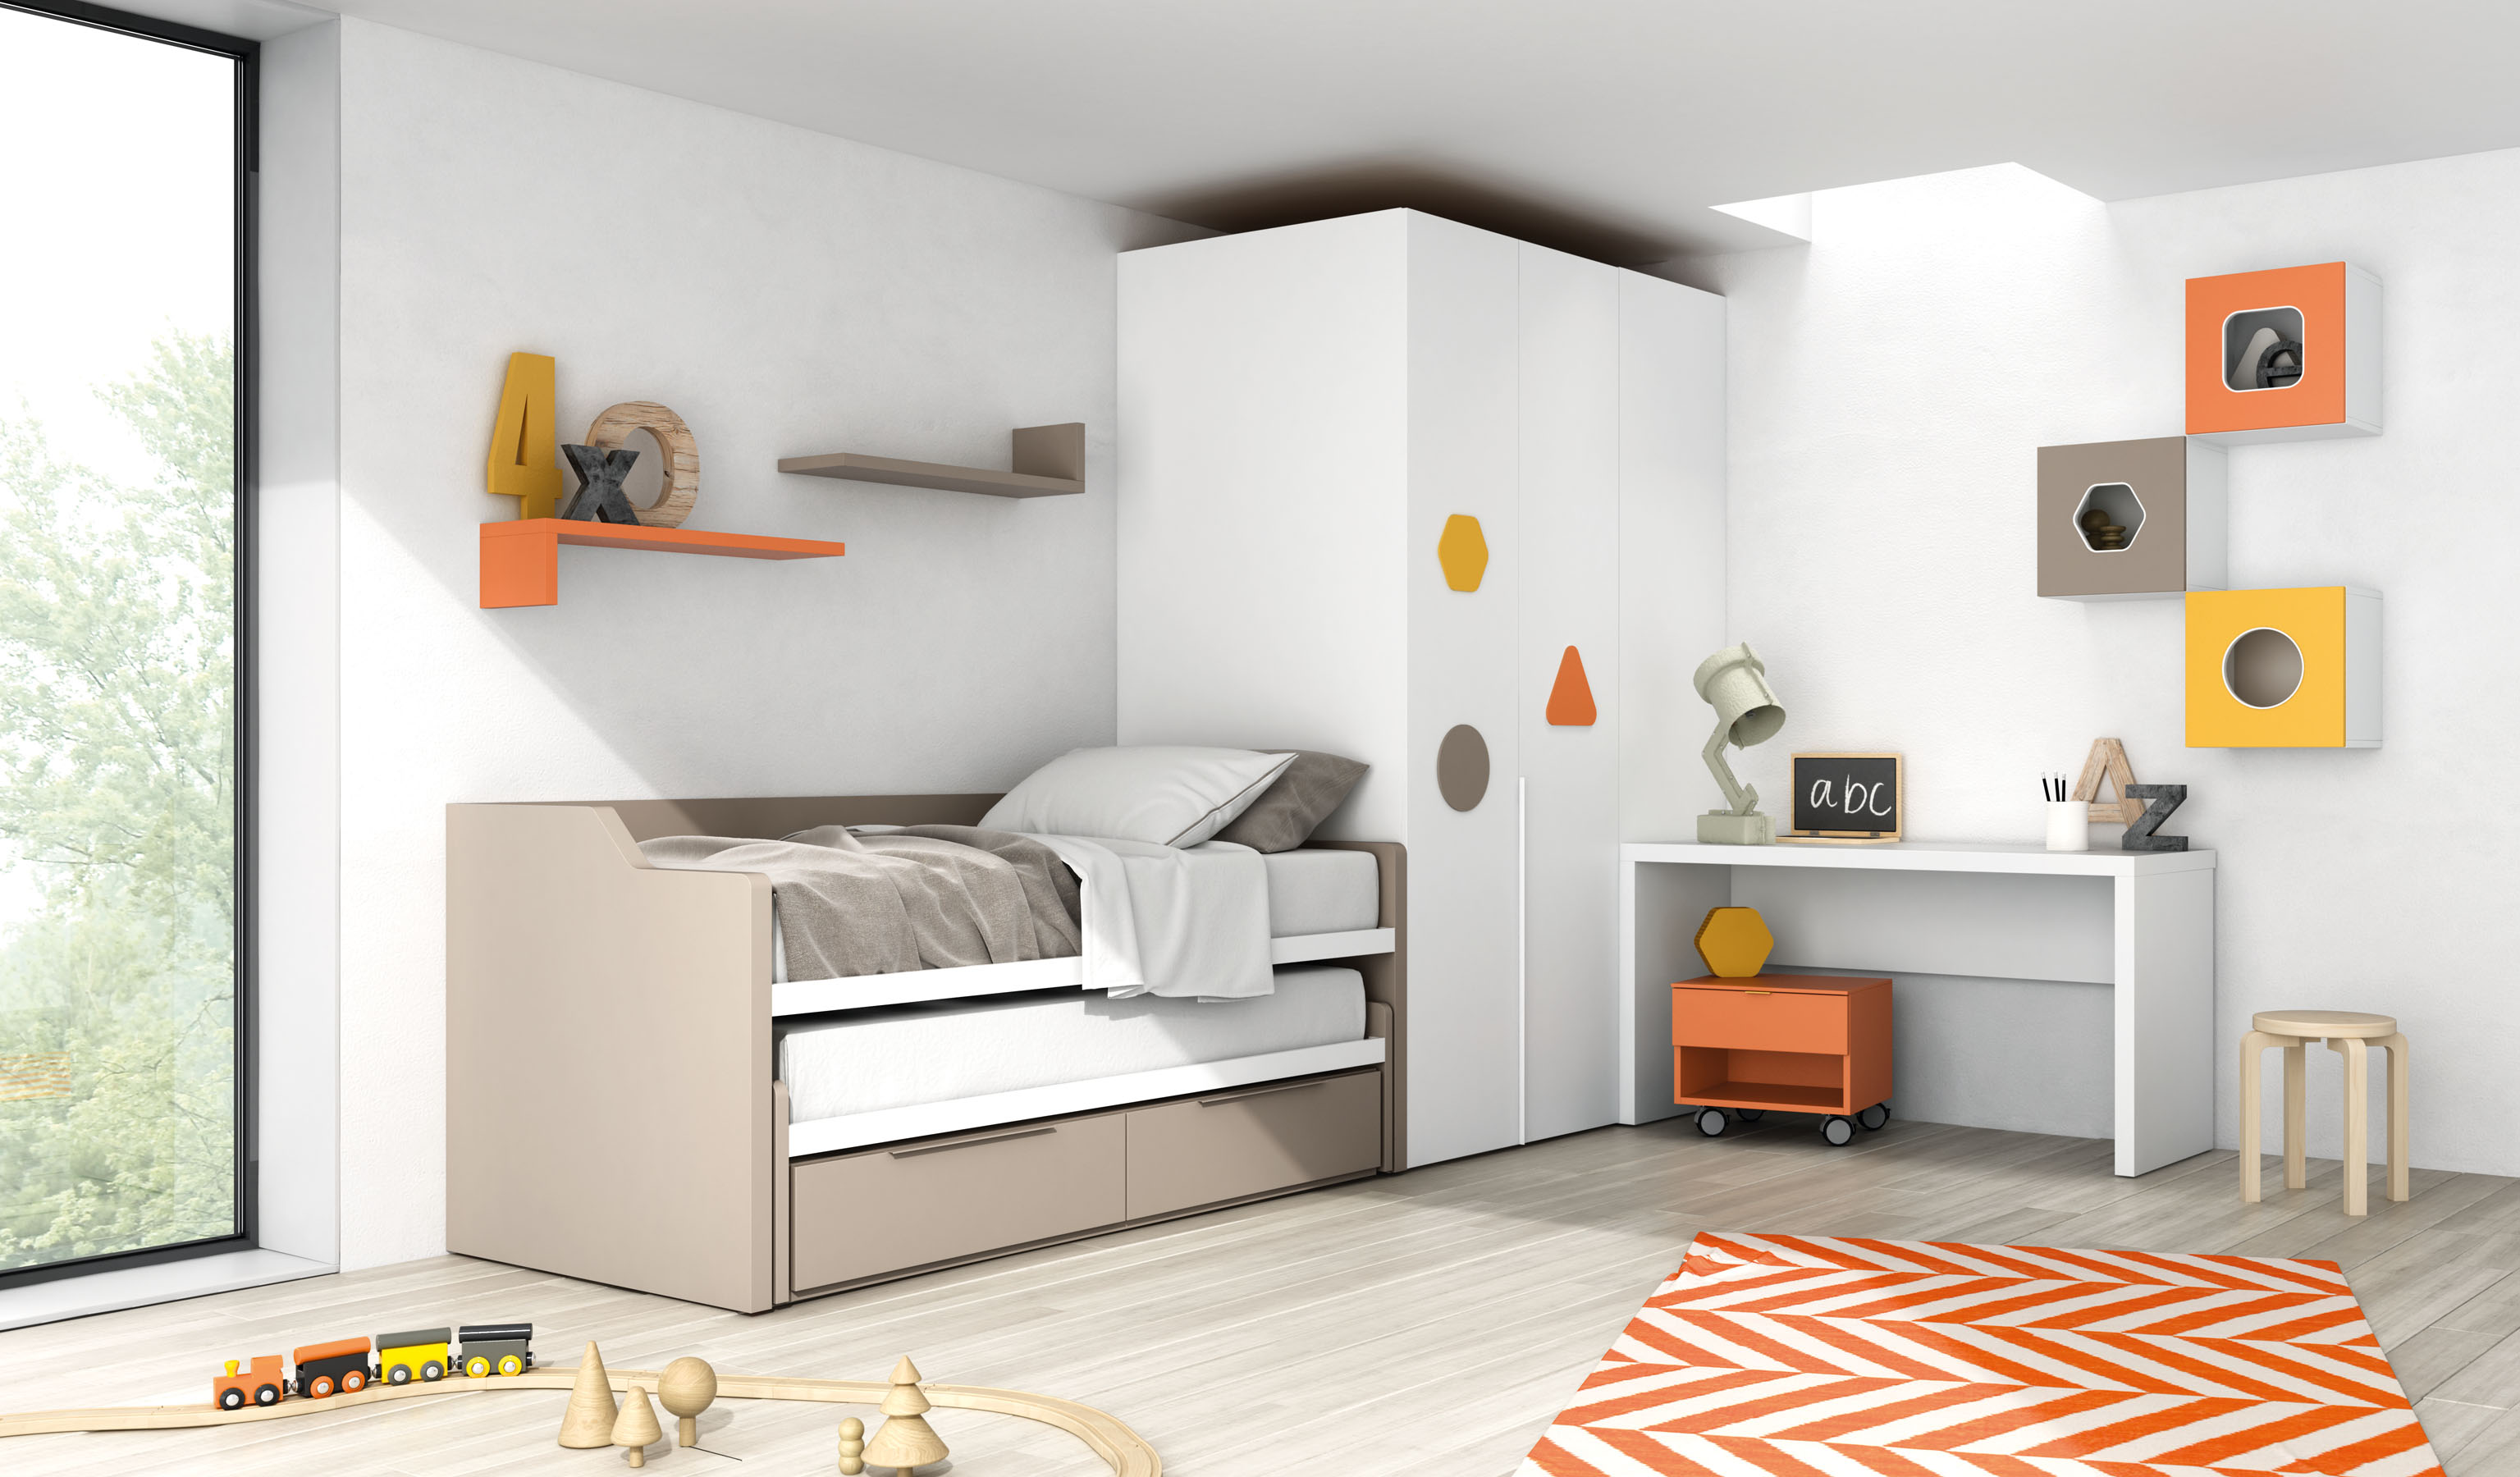 Compactos camas nido qb tegar - Cama nido economica ...